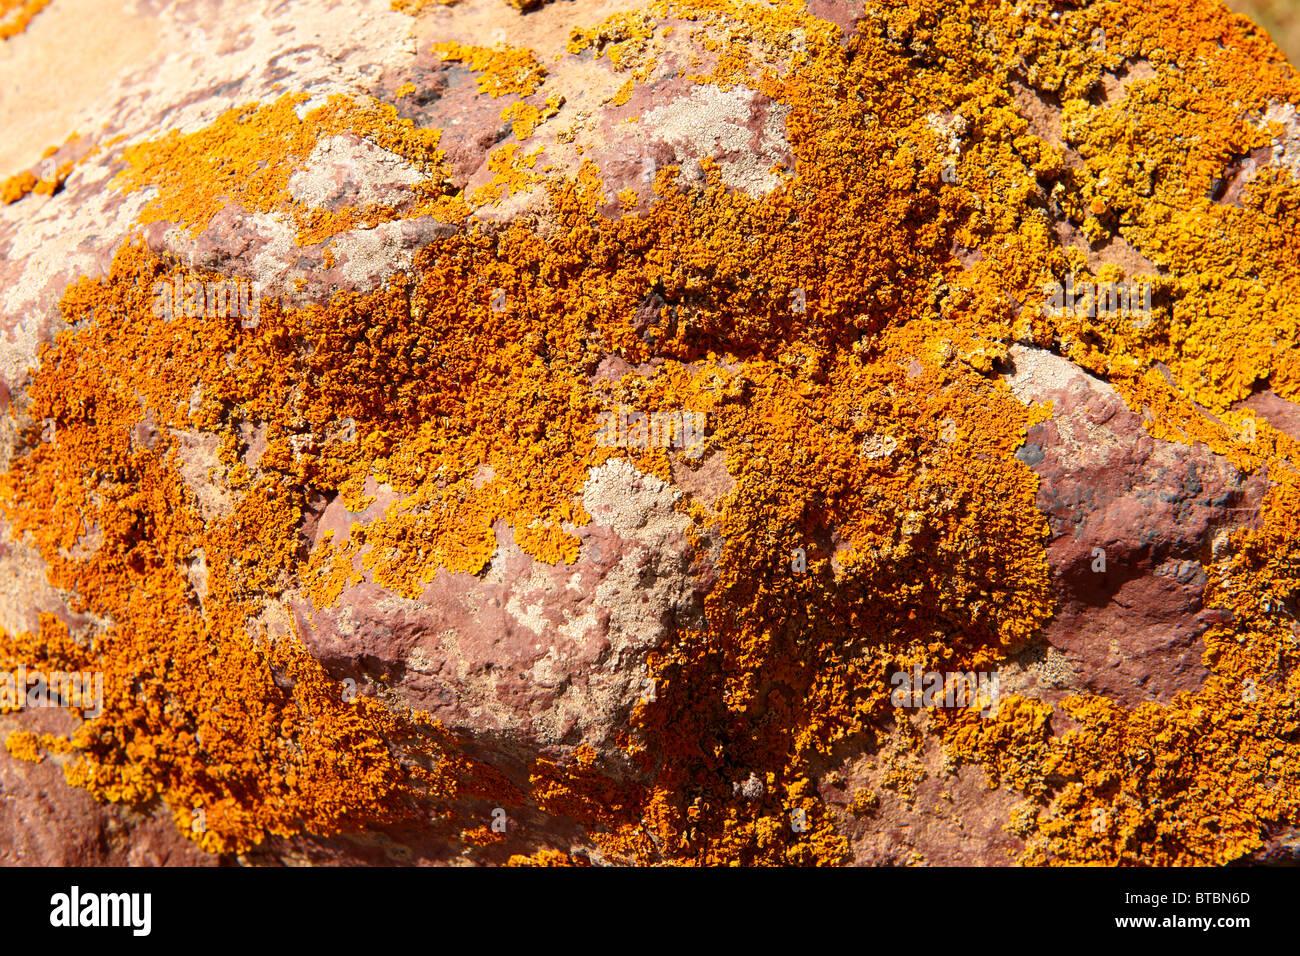 Orange lichen on a rock surface - Stock Image